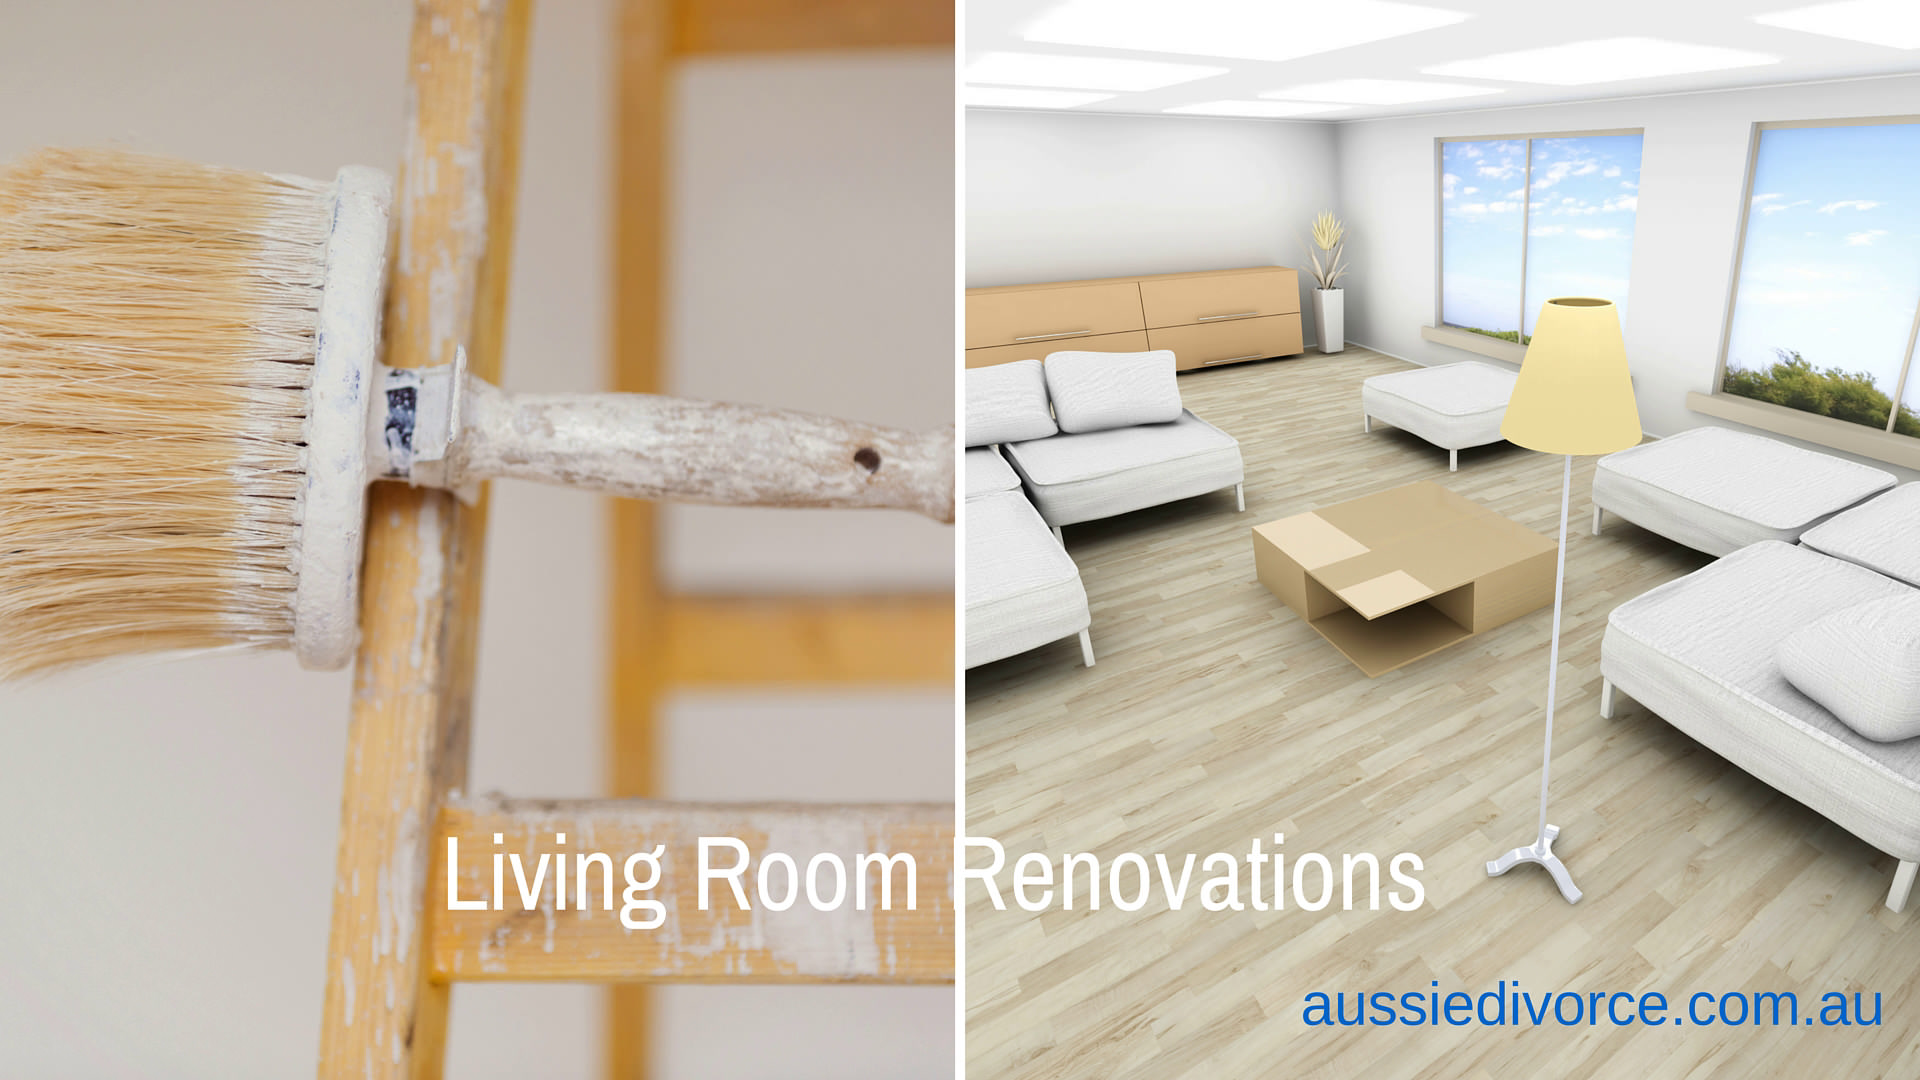 living room renovation by aussiedivorce.com.au